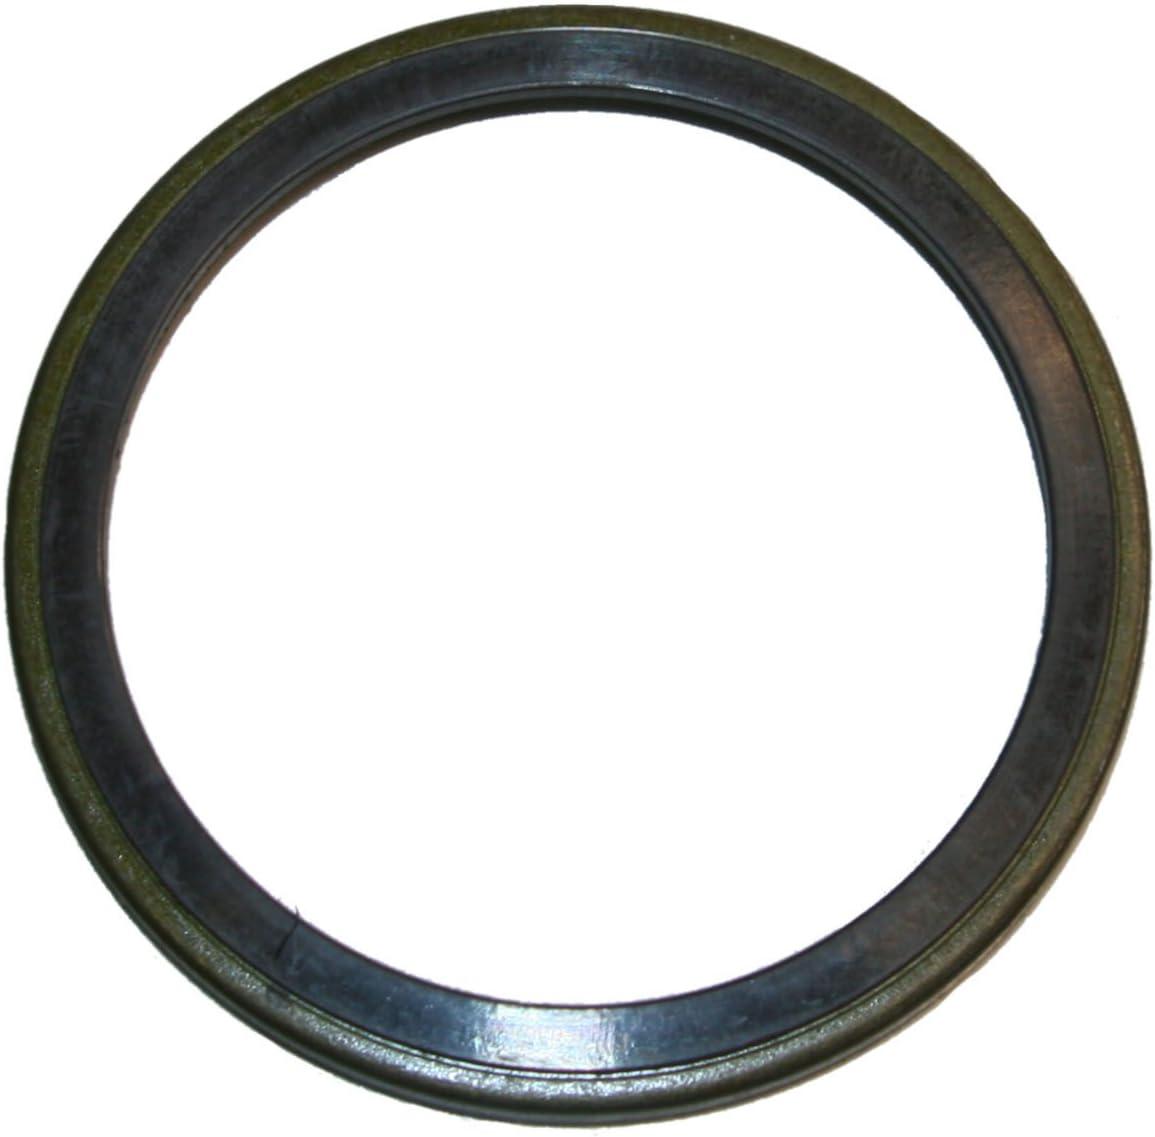 2 St/ück DAKAtec 400054 ABS Ring Hinterachse